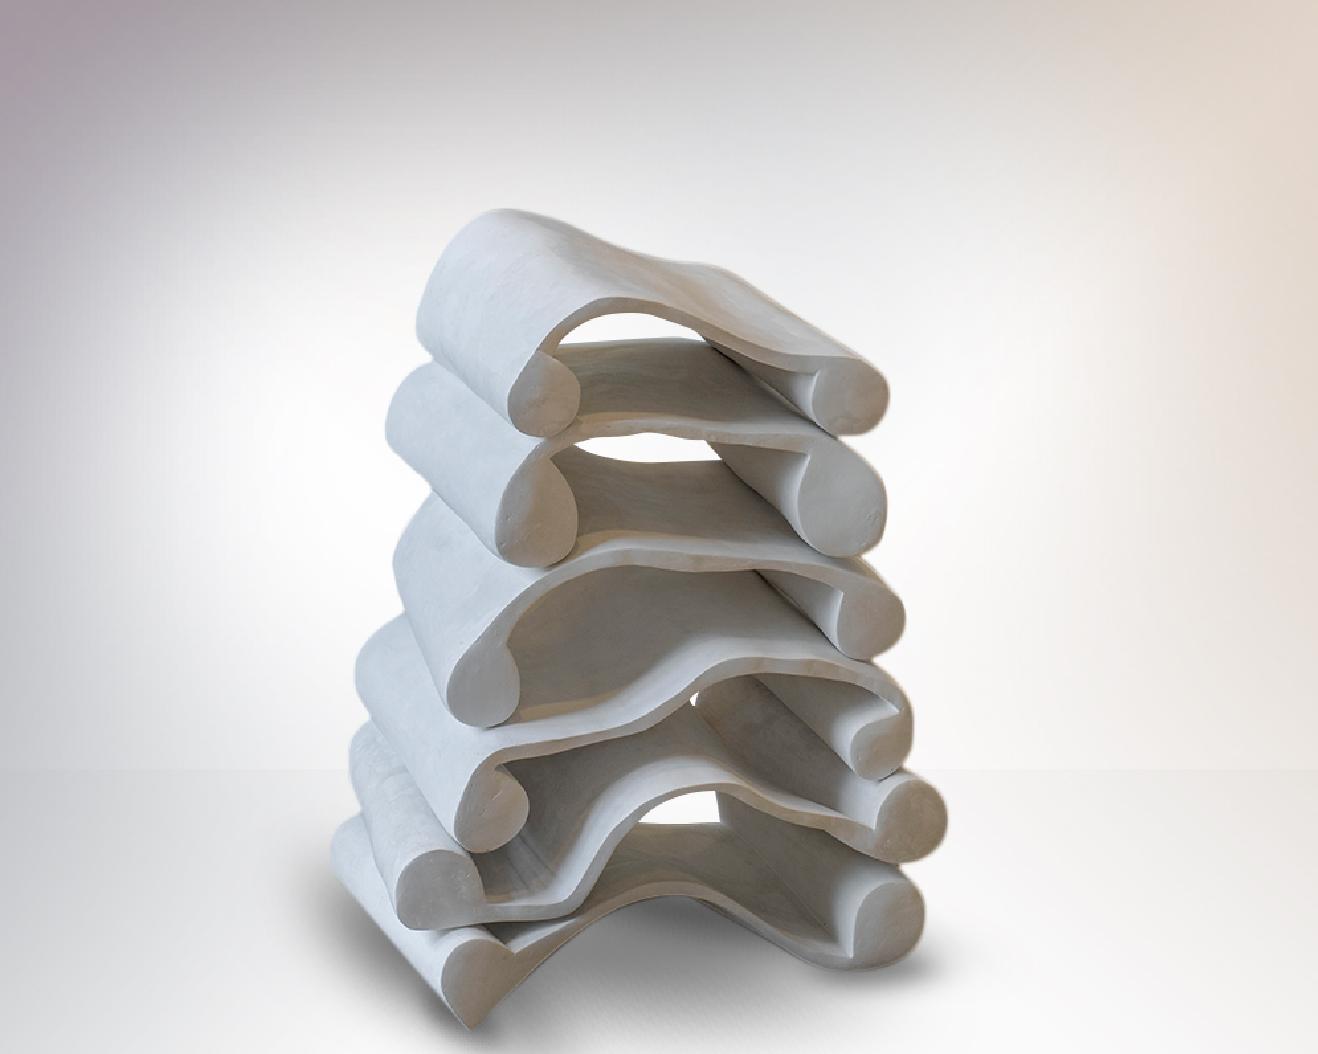 Sculpture-Carola-Eggeling-SavannahBay